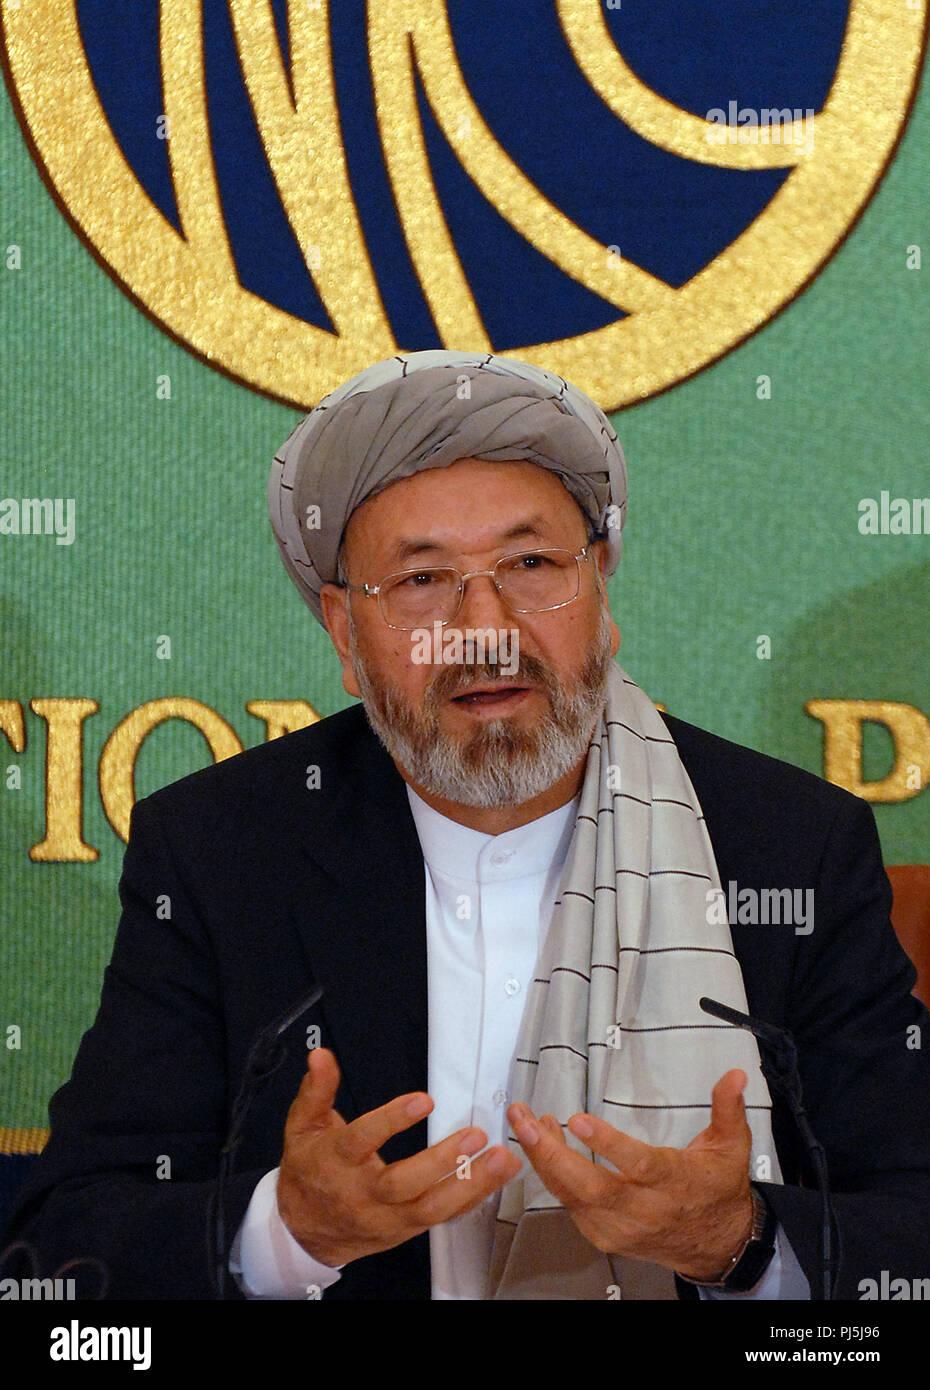 Abdul Karim Khalili, the current chairman of the Afghan High